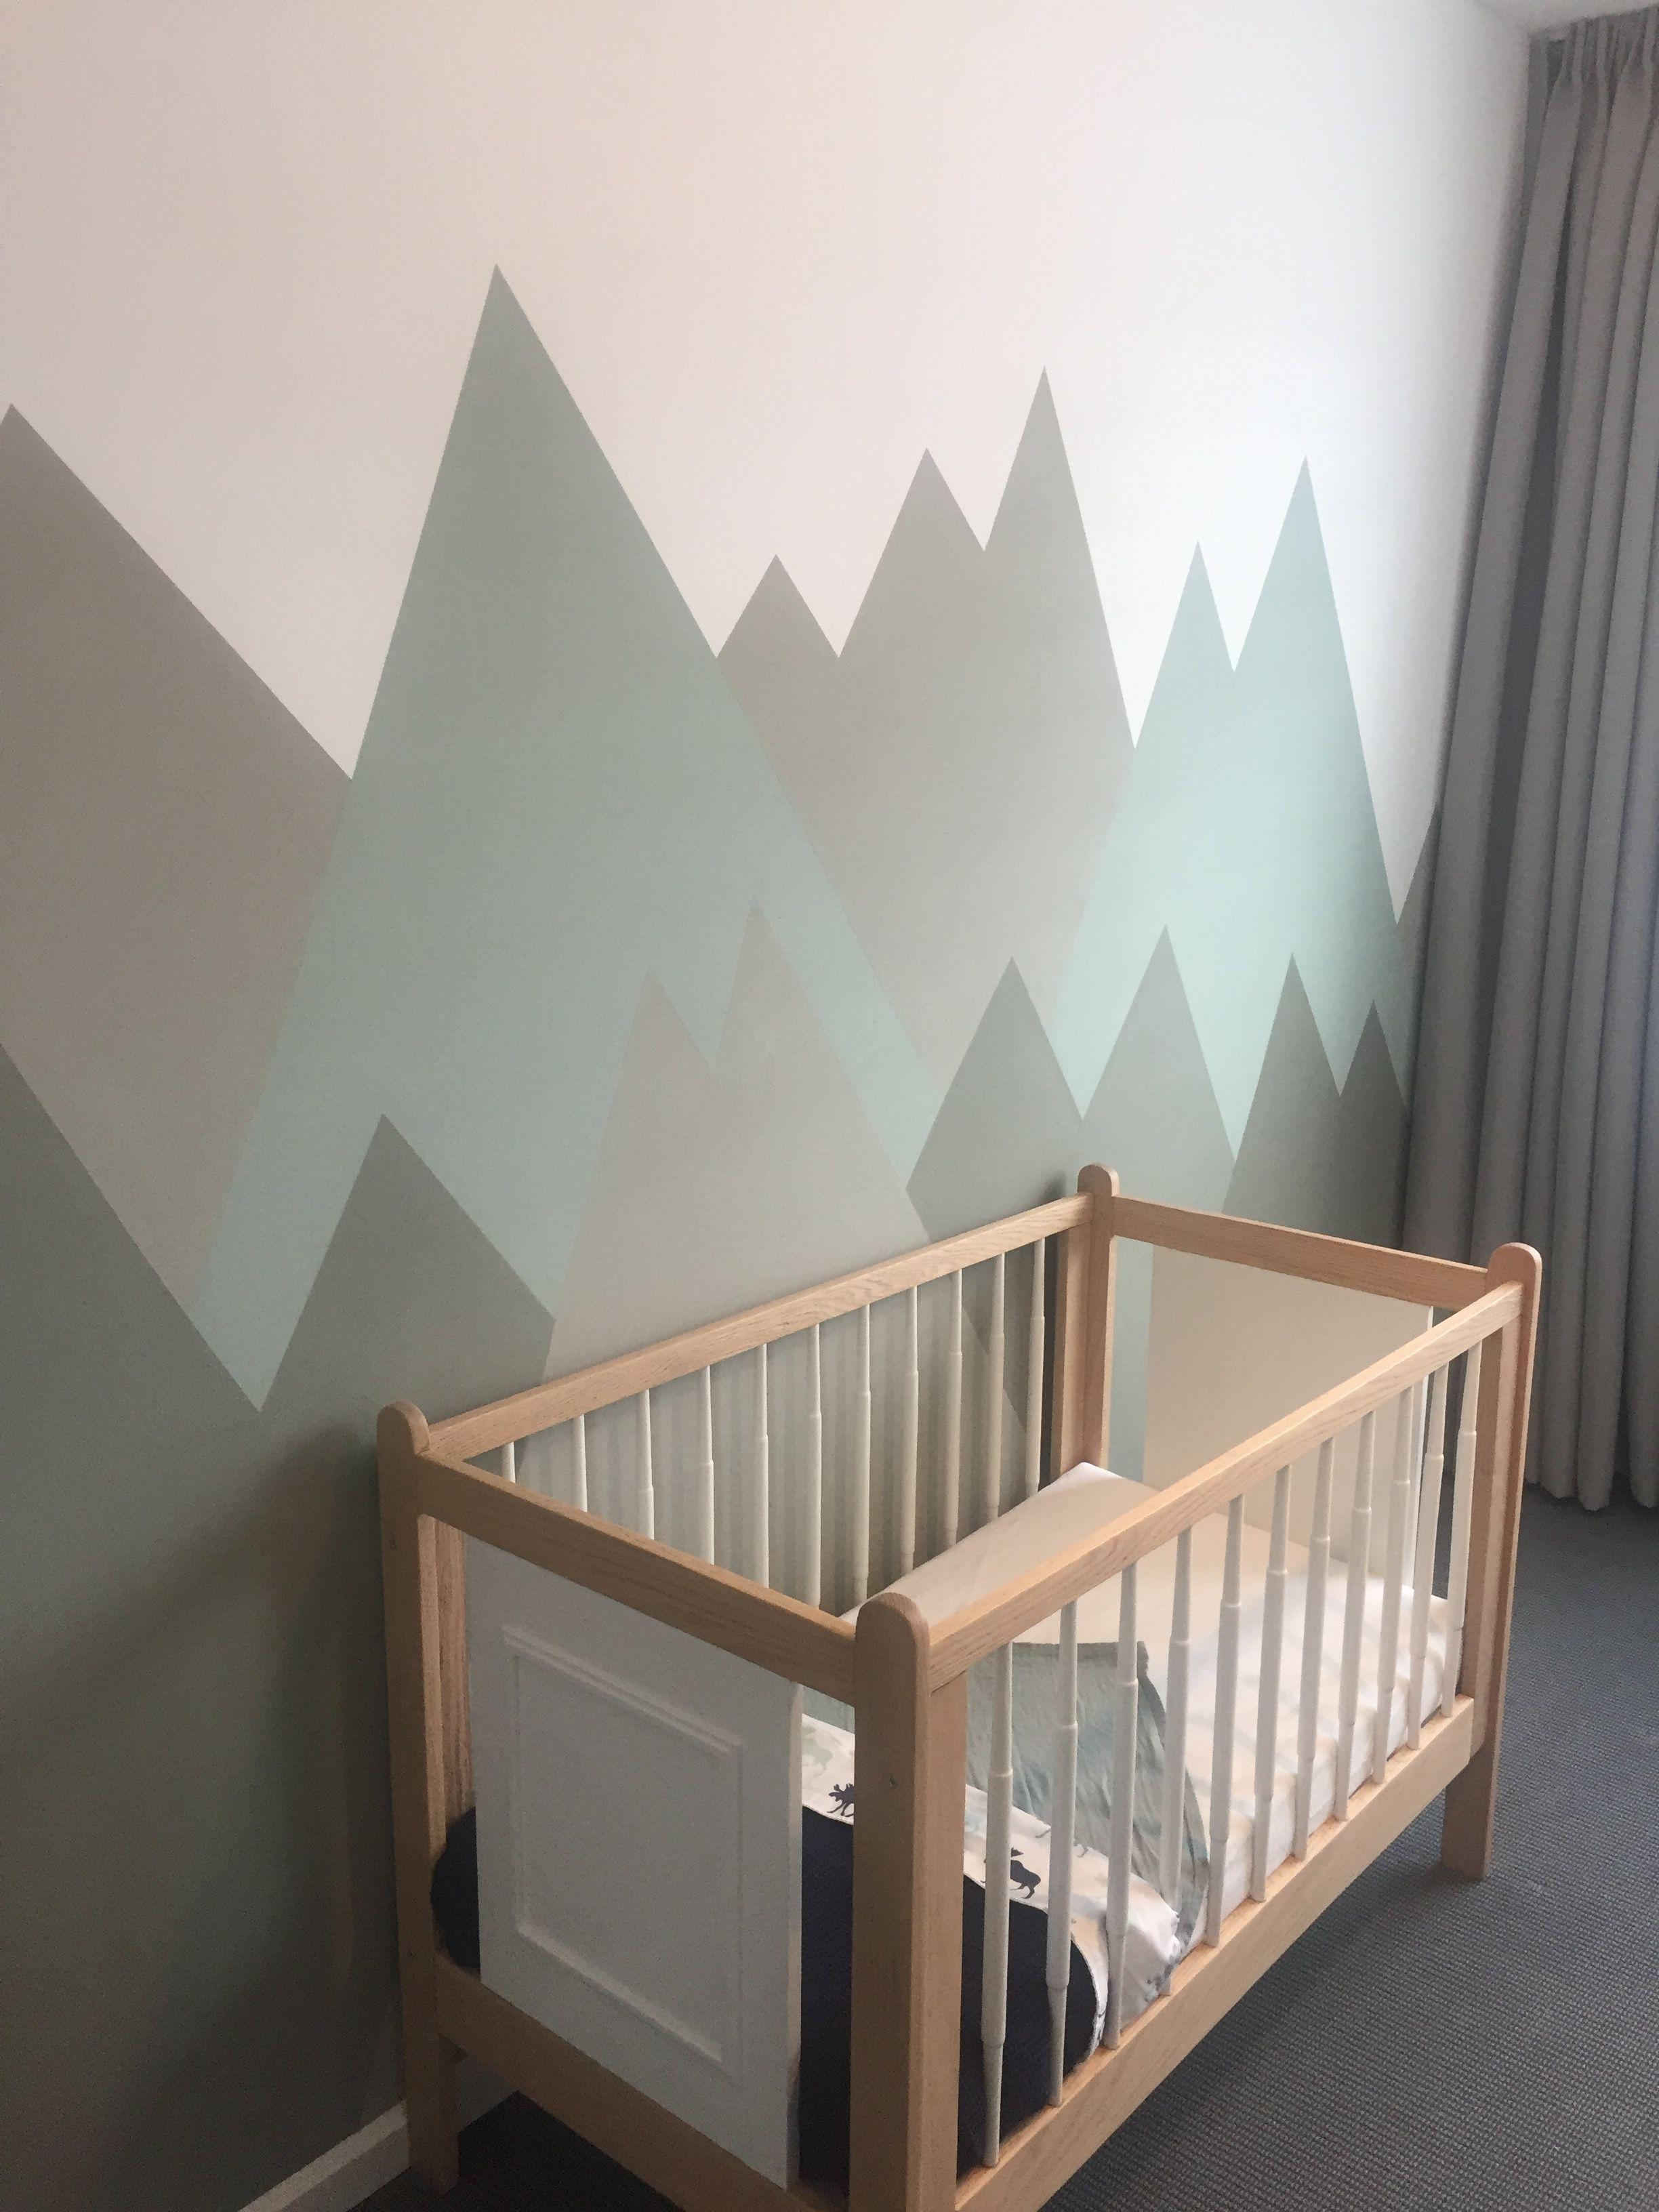 Gmail mountain theme pictures - Baby Boy Mountain Theme Vintage Crib Wood Mountain Nursery Babyboy Babyboysroom Vintage Ledikant Hout Babykamer Jongen